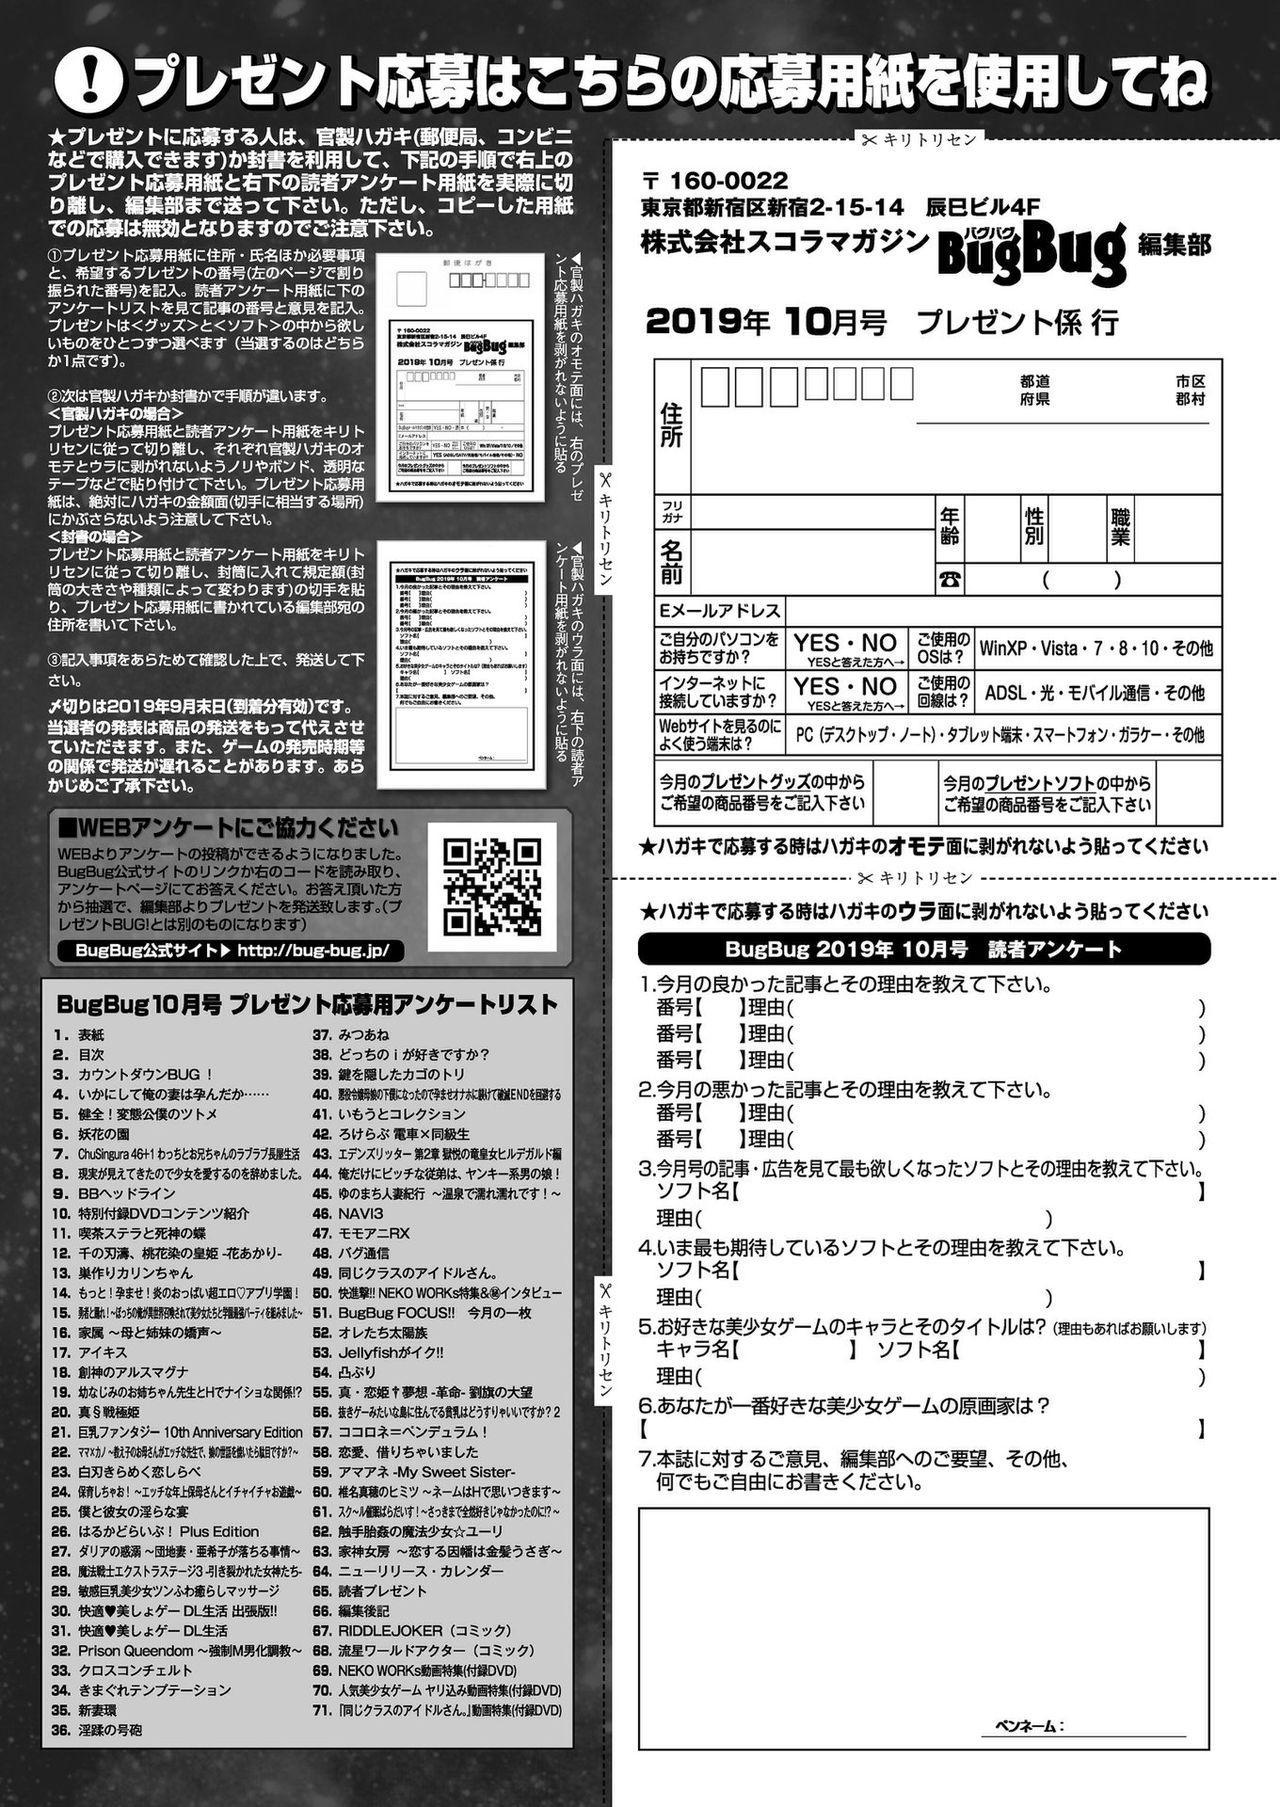 BugBug 2019-10 Vol. 302 143